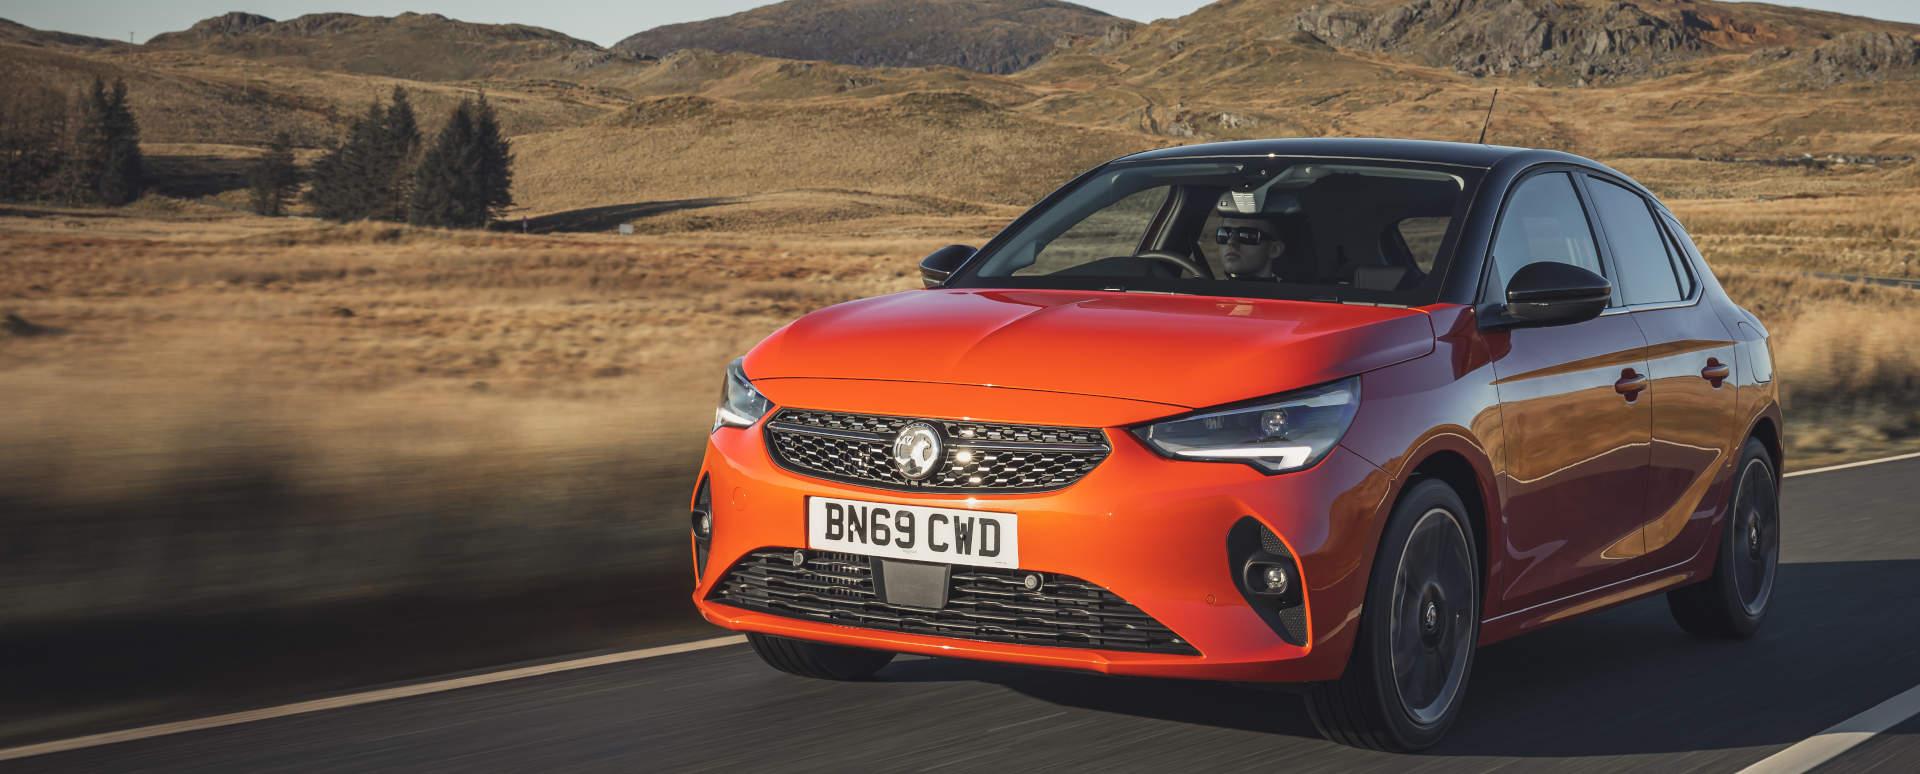 2020 Vauxhall Corsa F: Driving